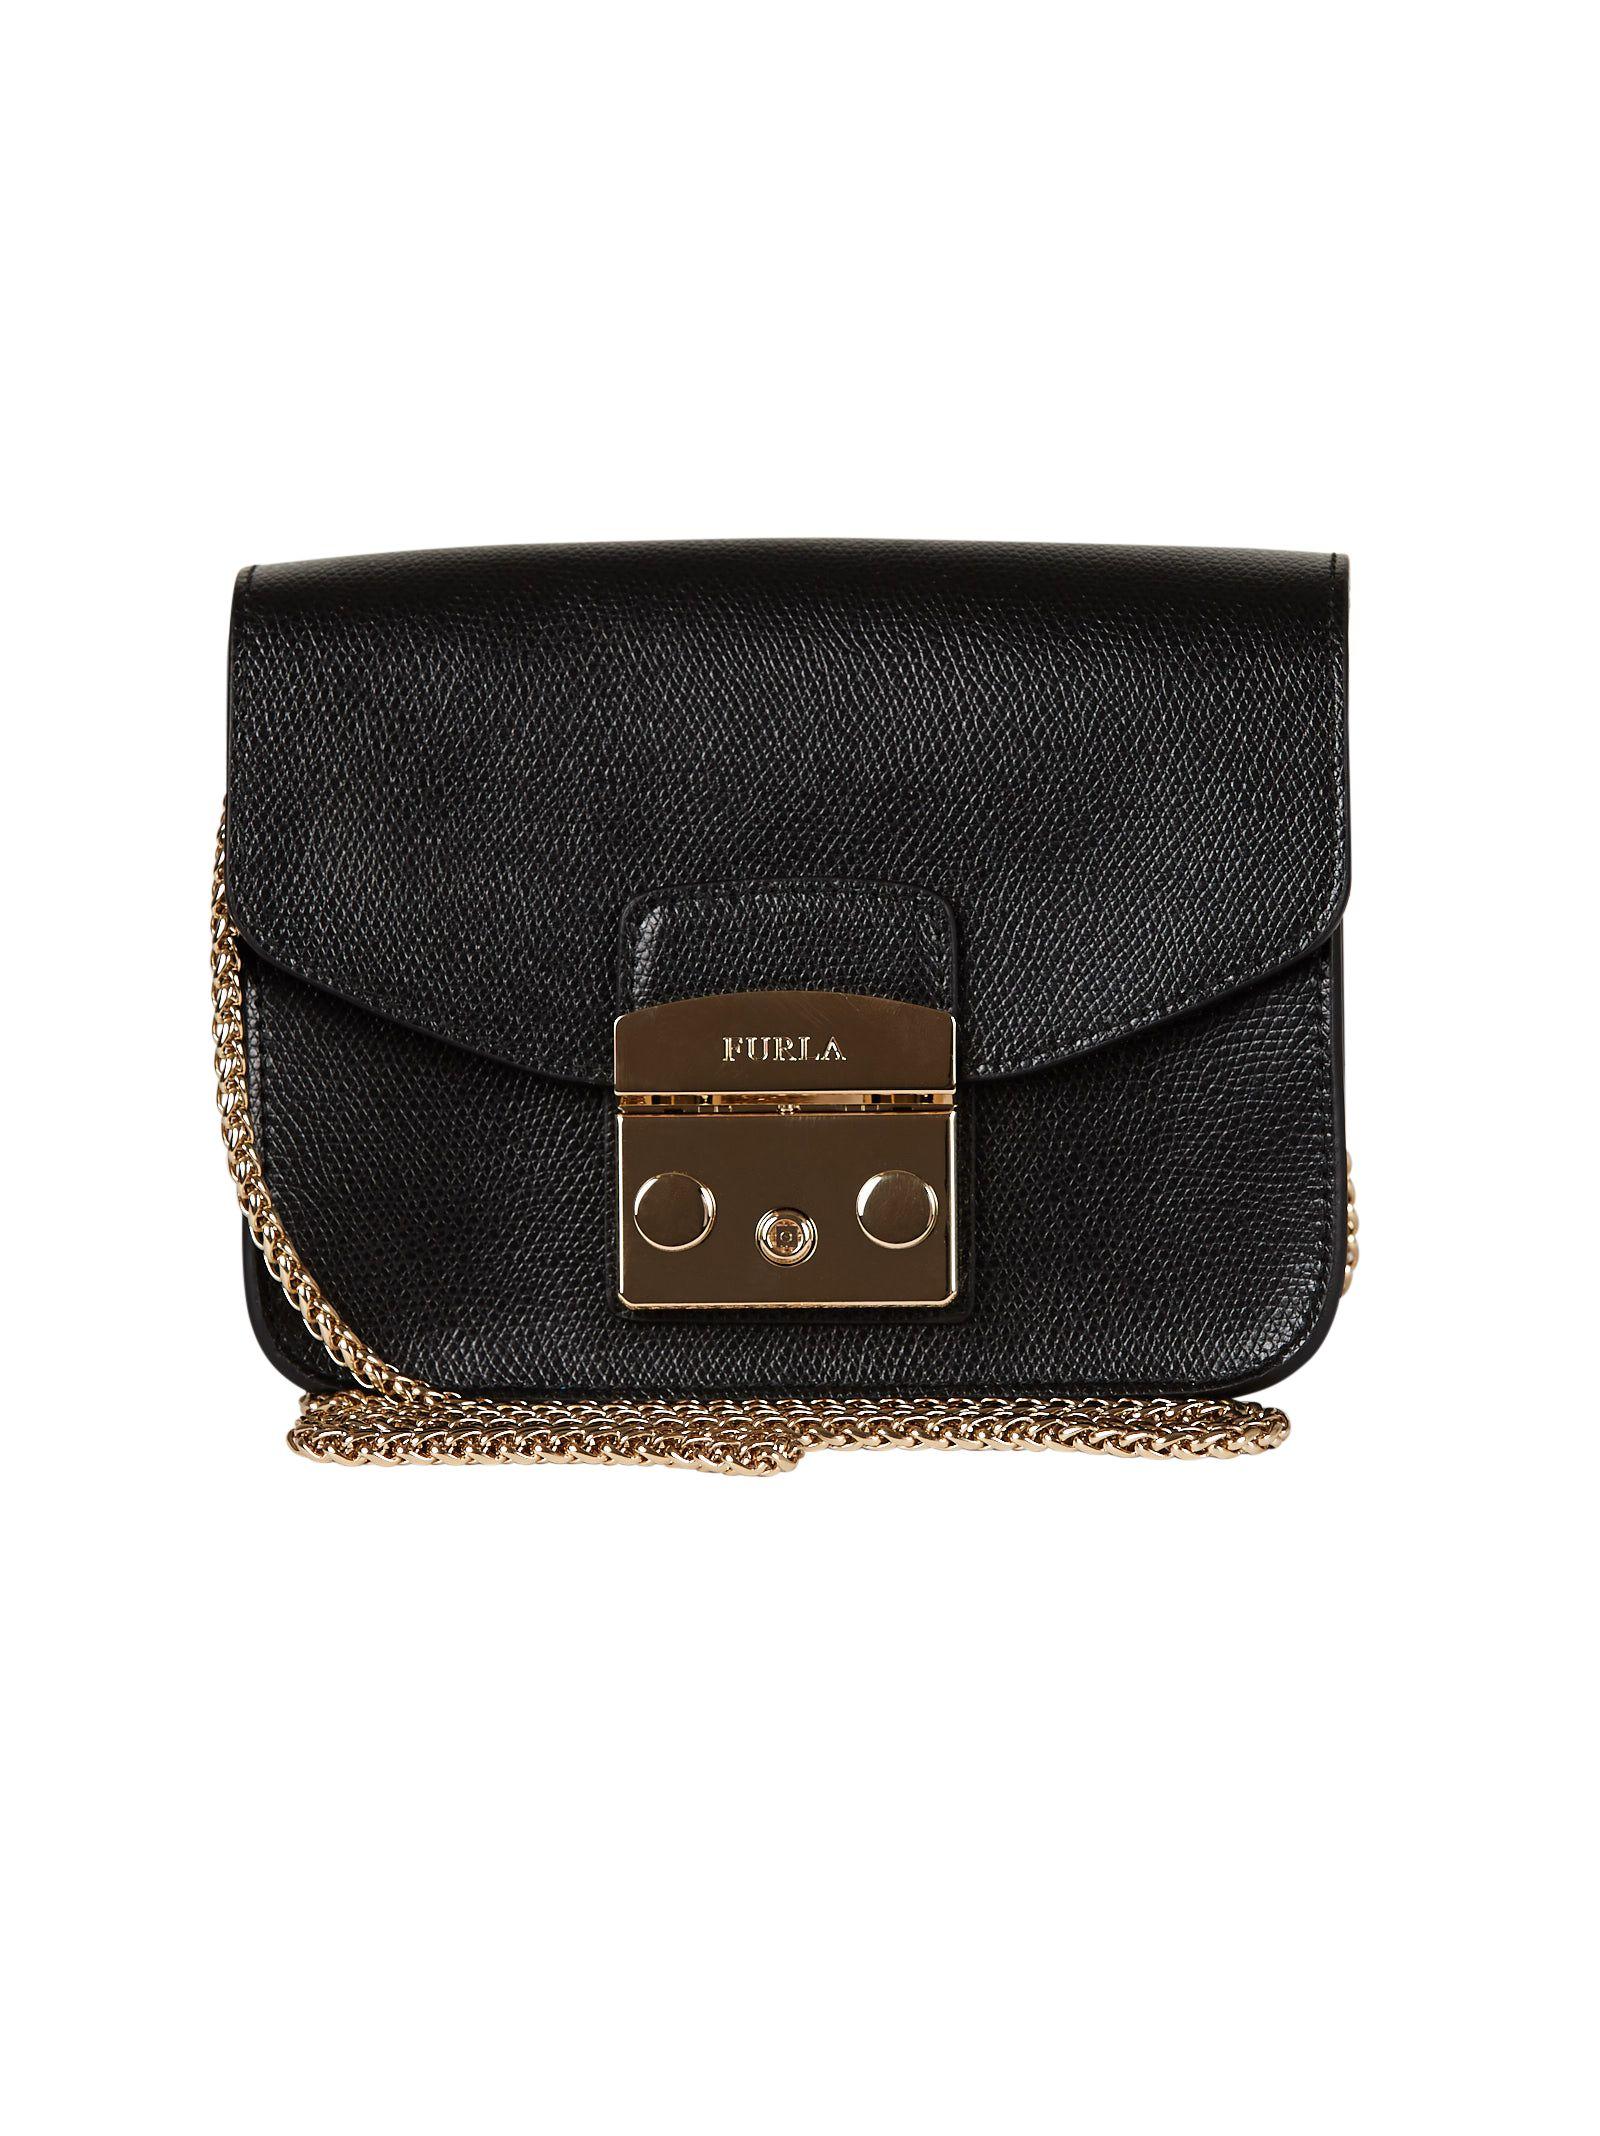 Furla Small Metropolis Shoulder Bag